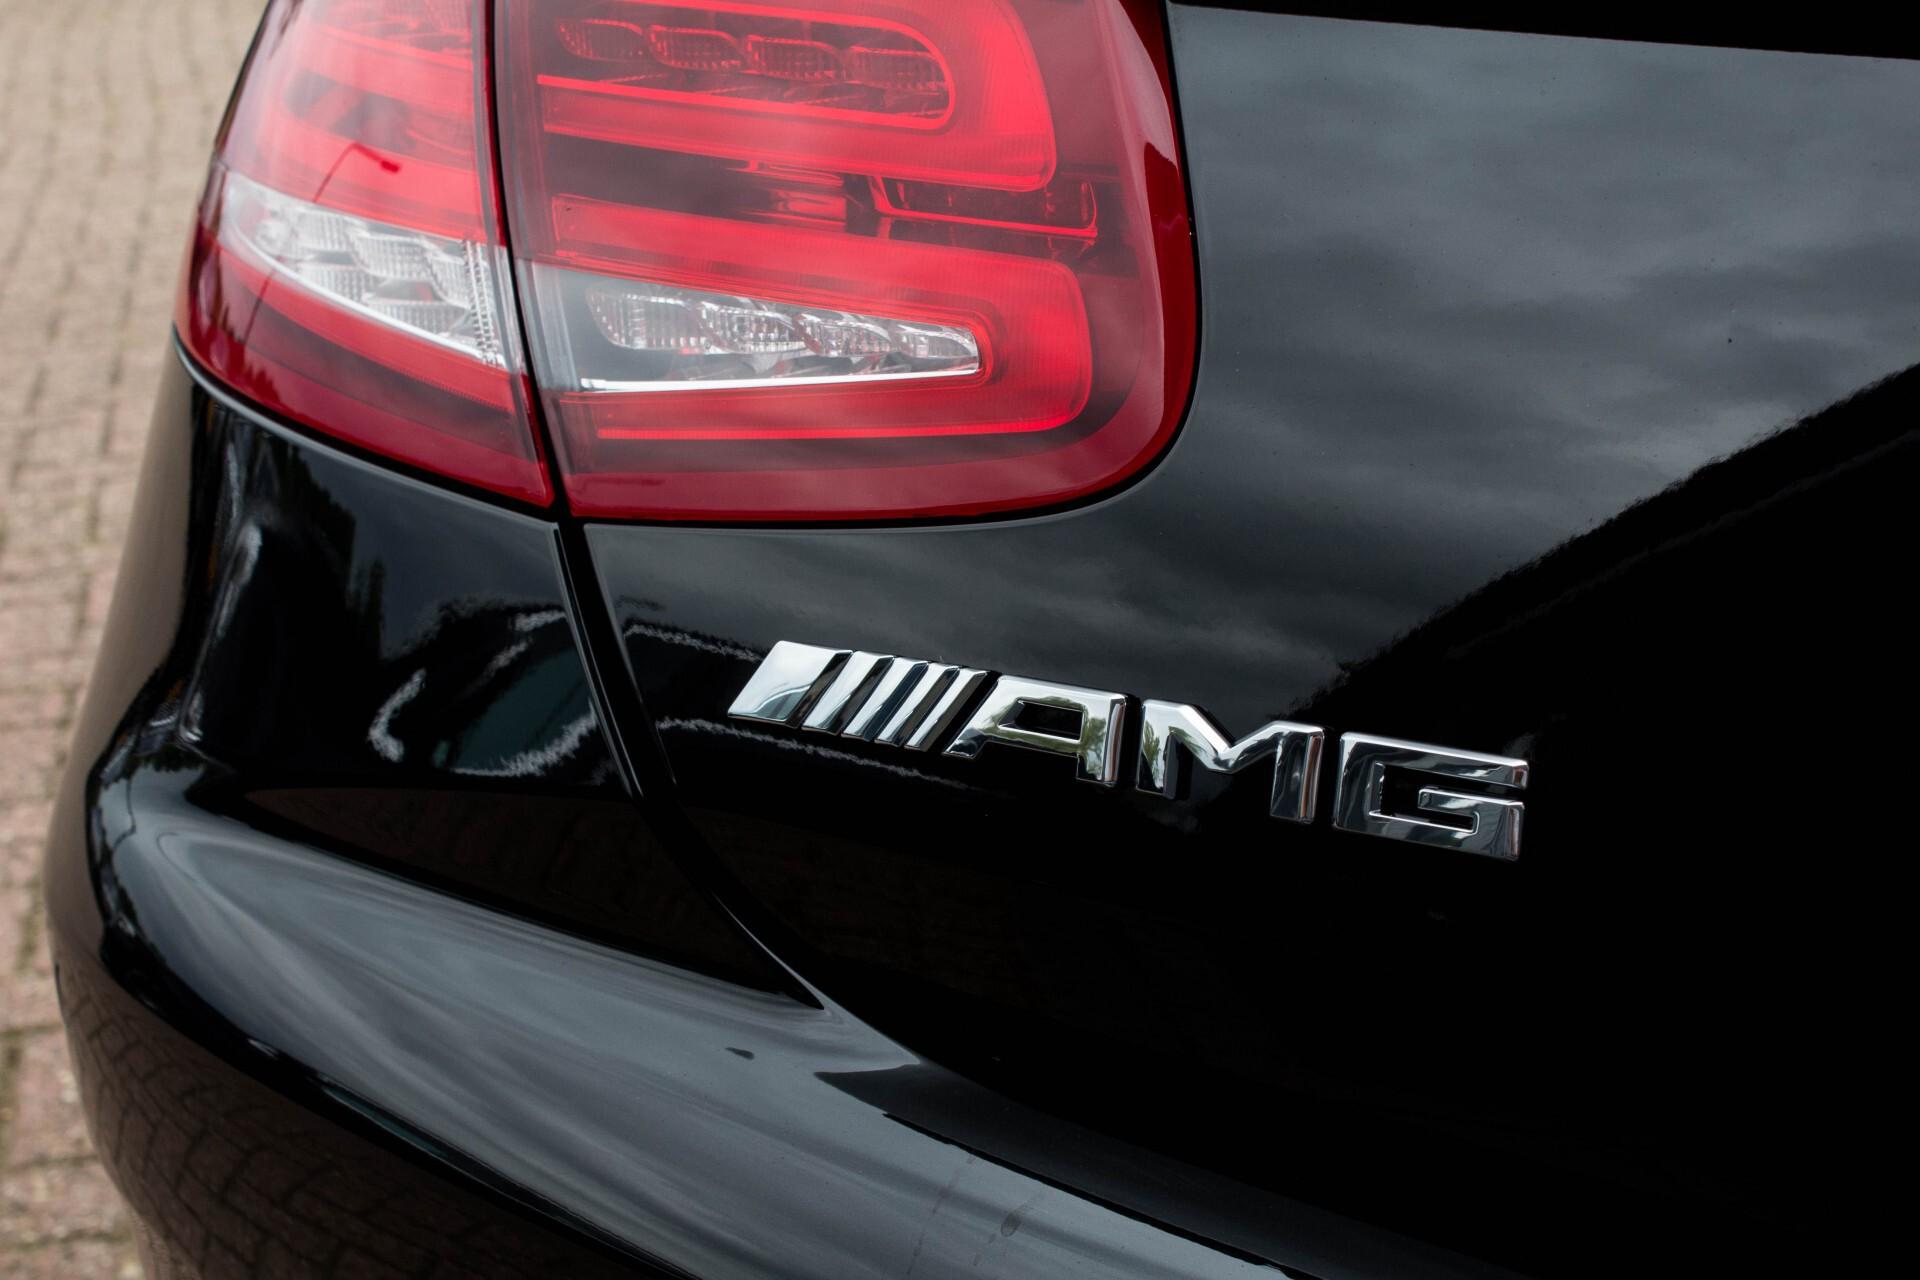 Mercedes-Benz S-Klasse Cabrio 63 AMG 4-M Ceramic/Designo/Carbon/Burmester High End Aut Foto 65